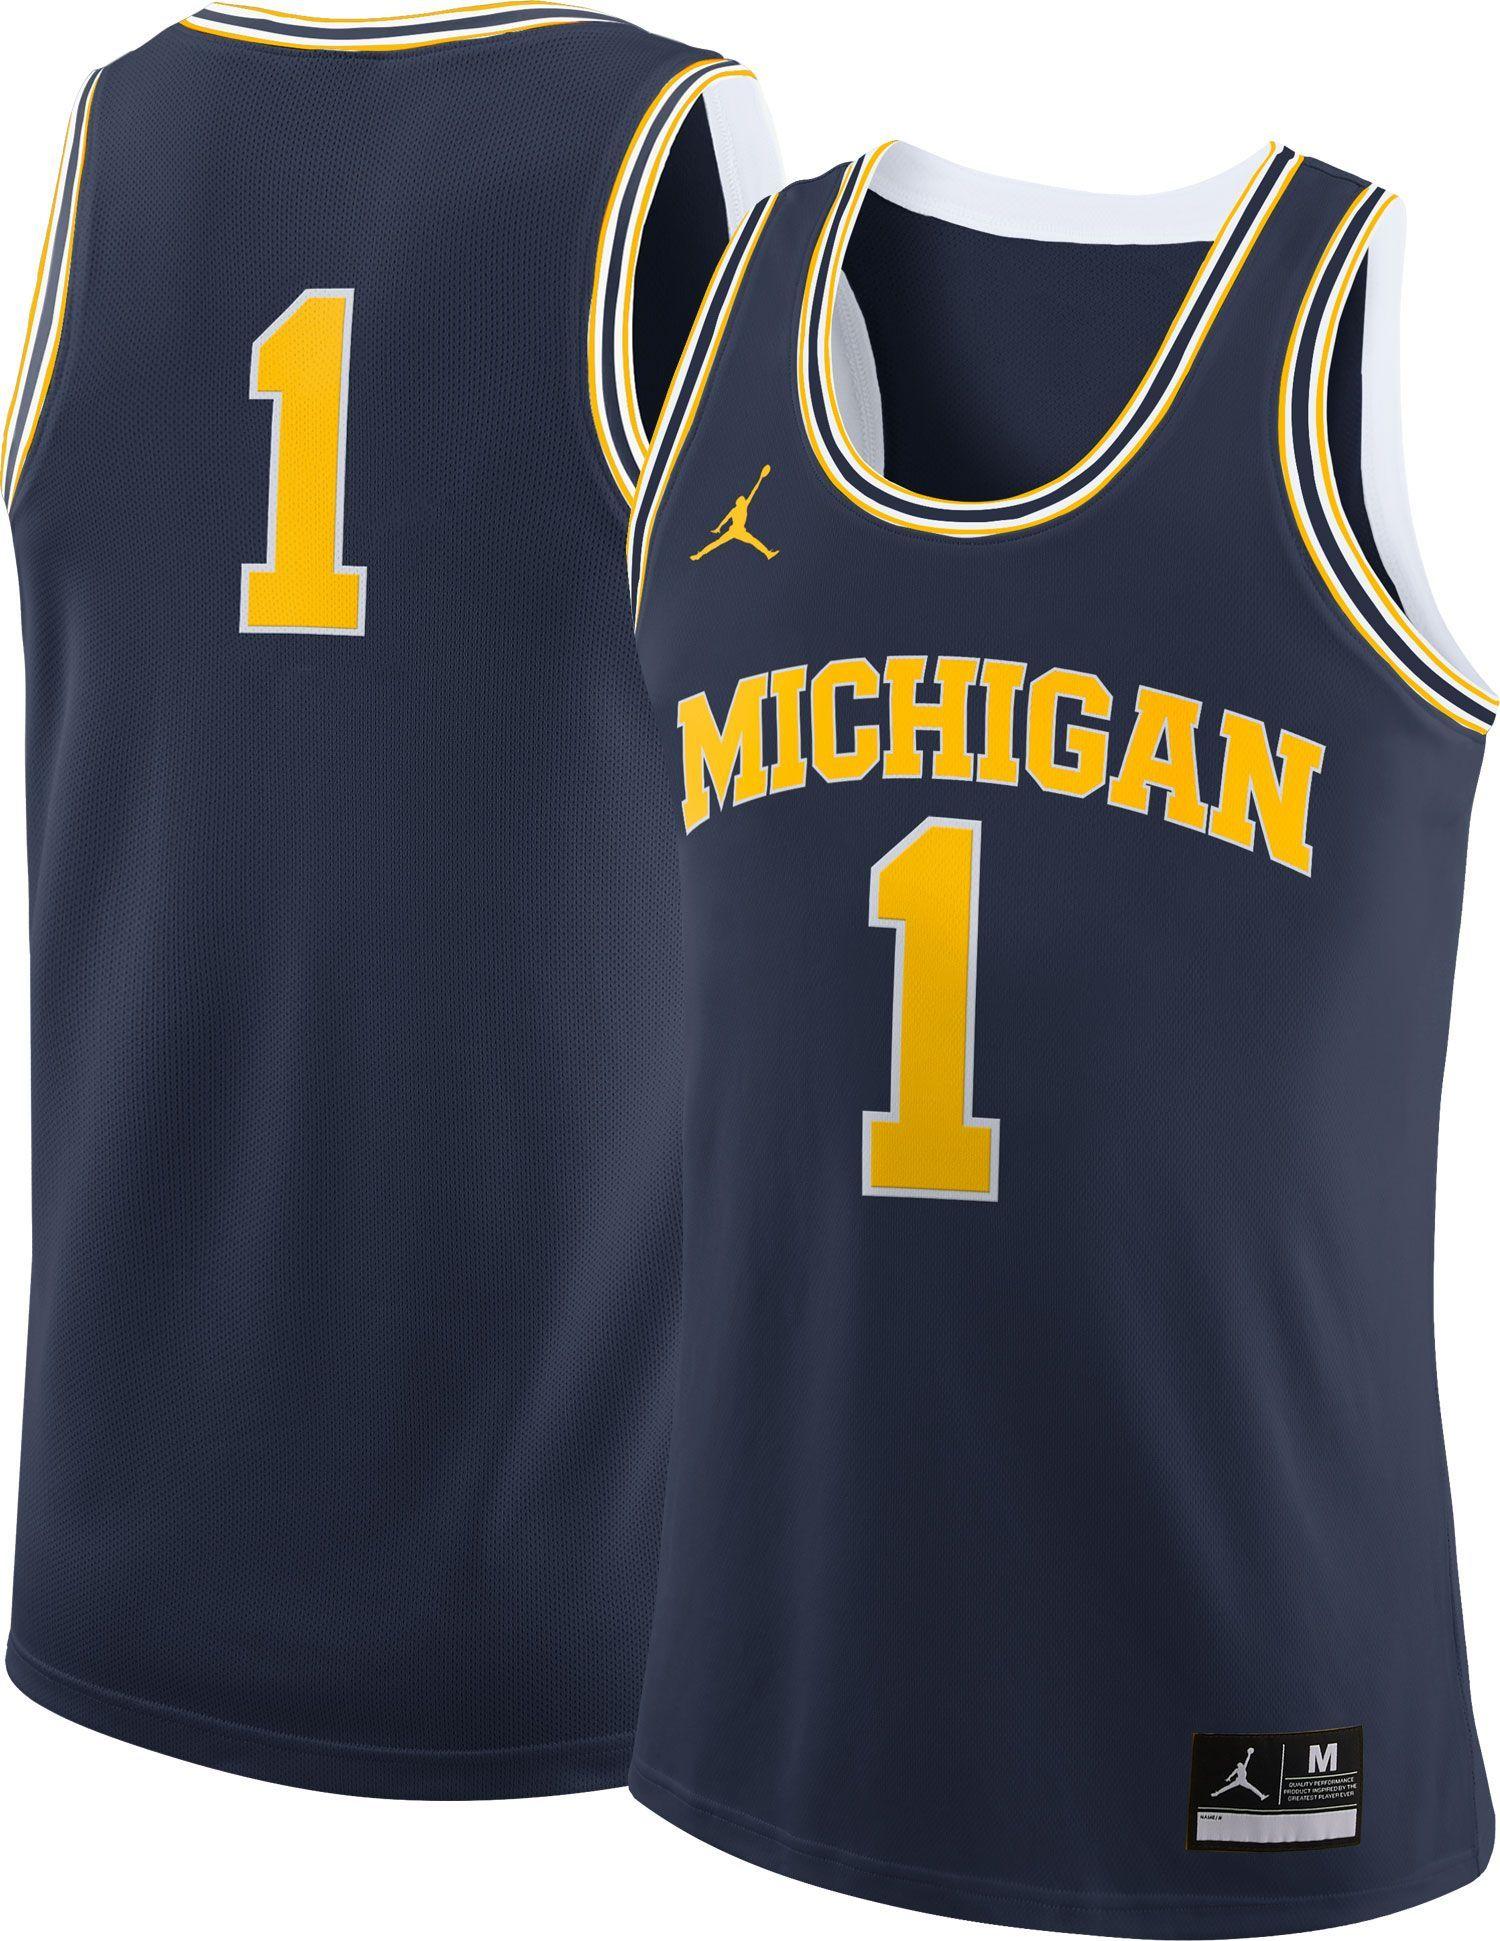 688fdc289d2 Jordan Men's Michigan Wolverines #1 Blue Replica Basketball Jersey ...